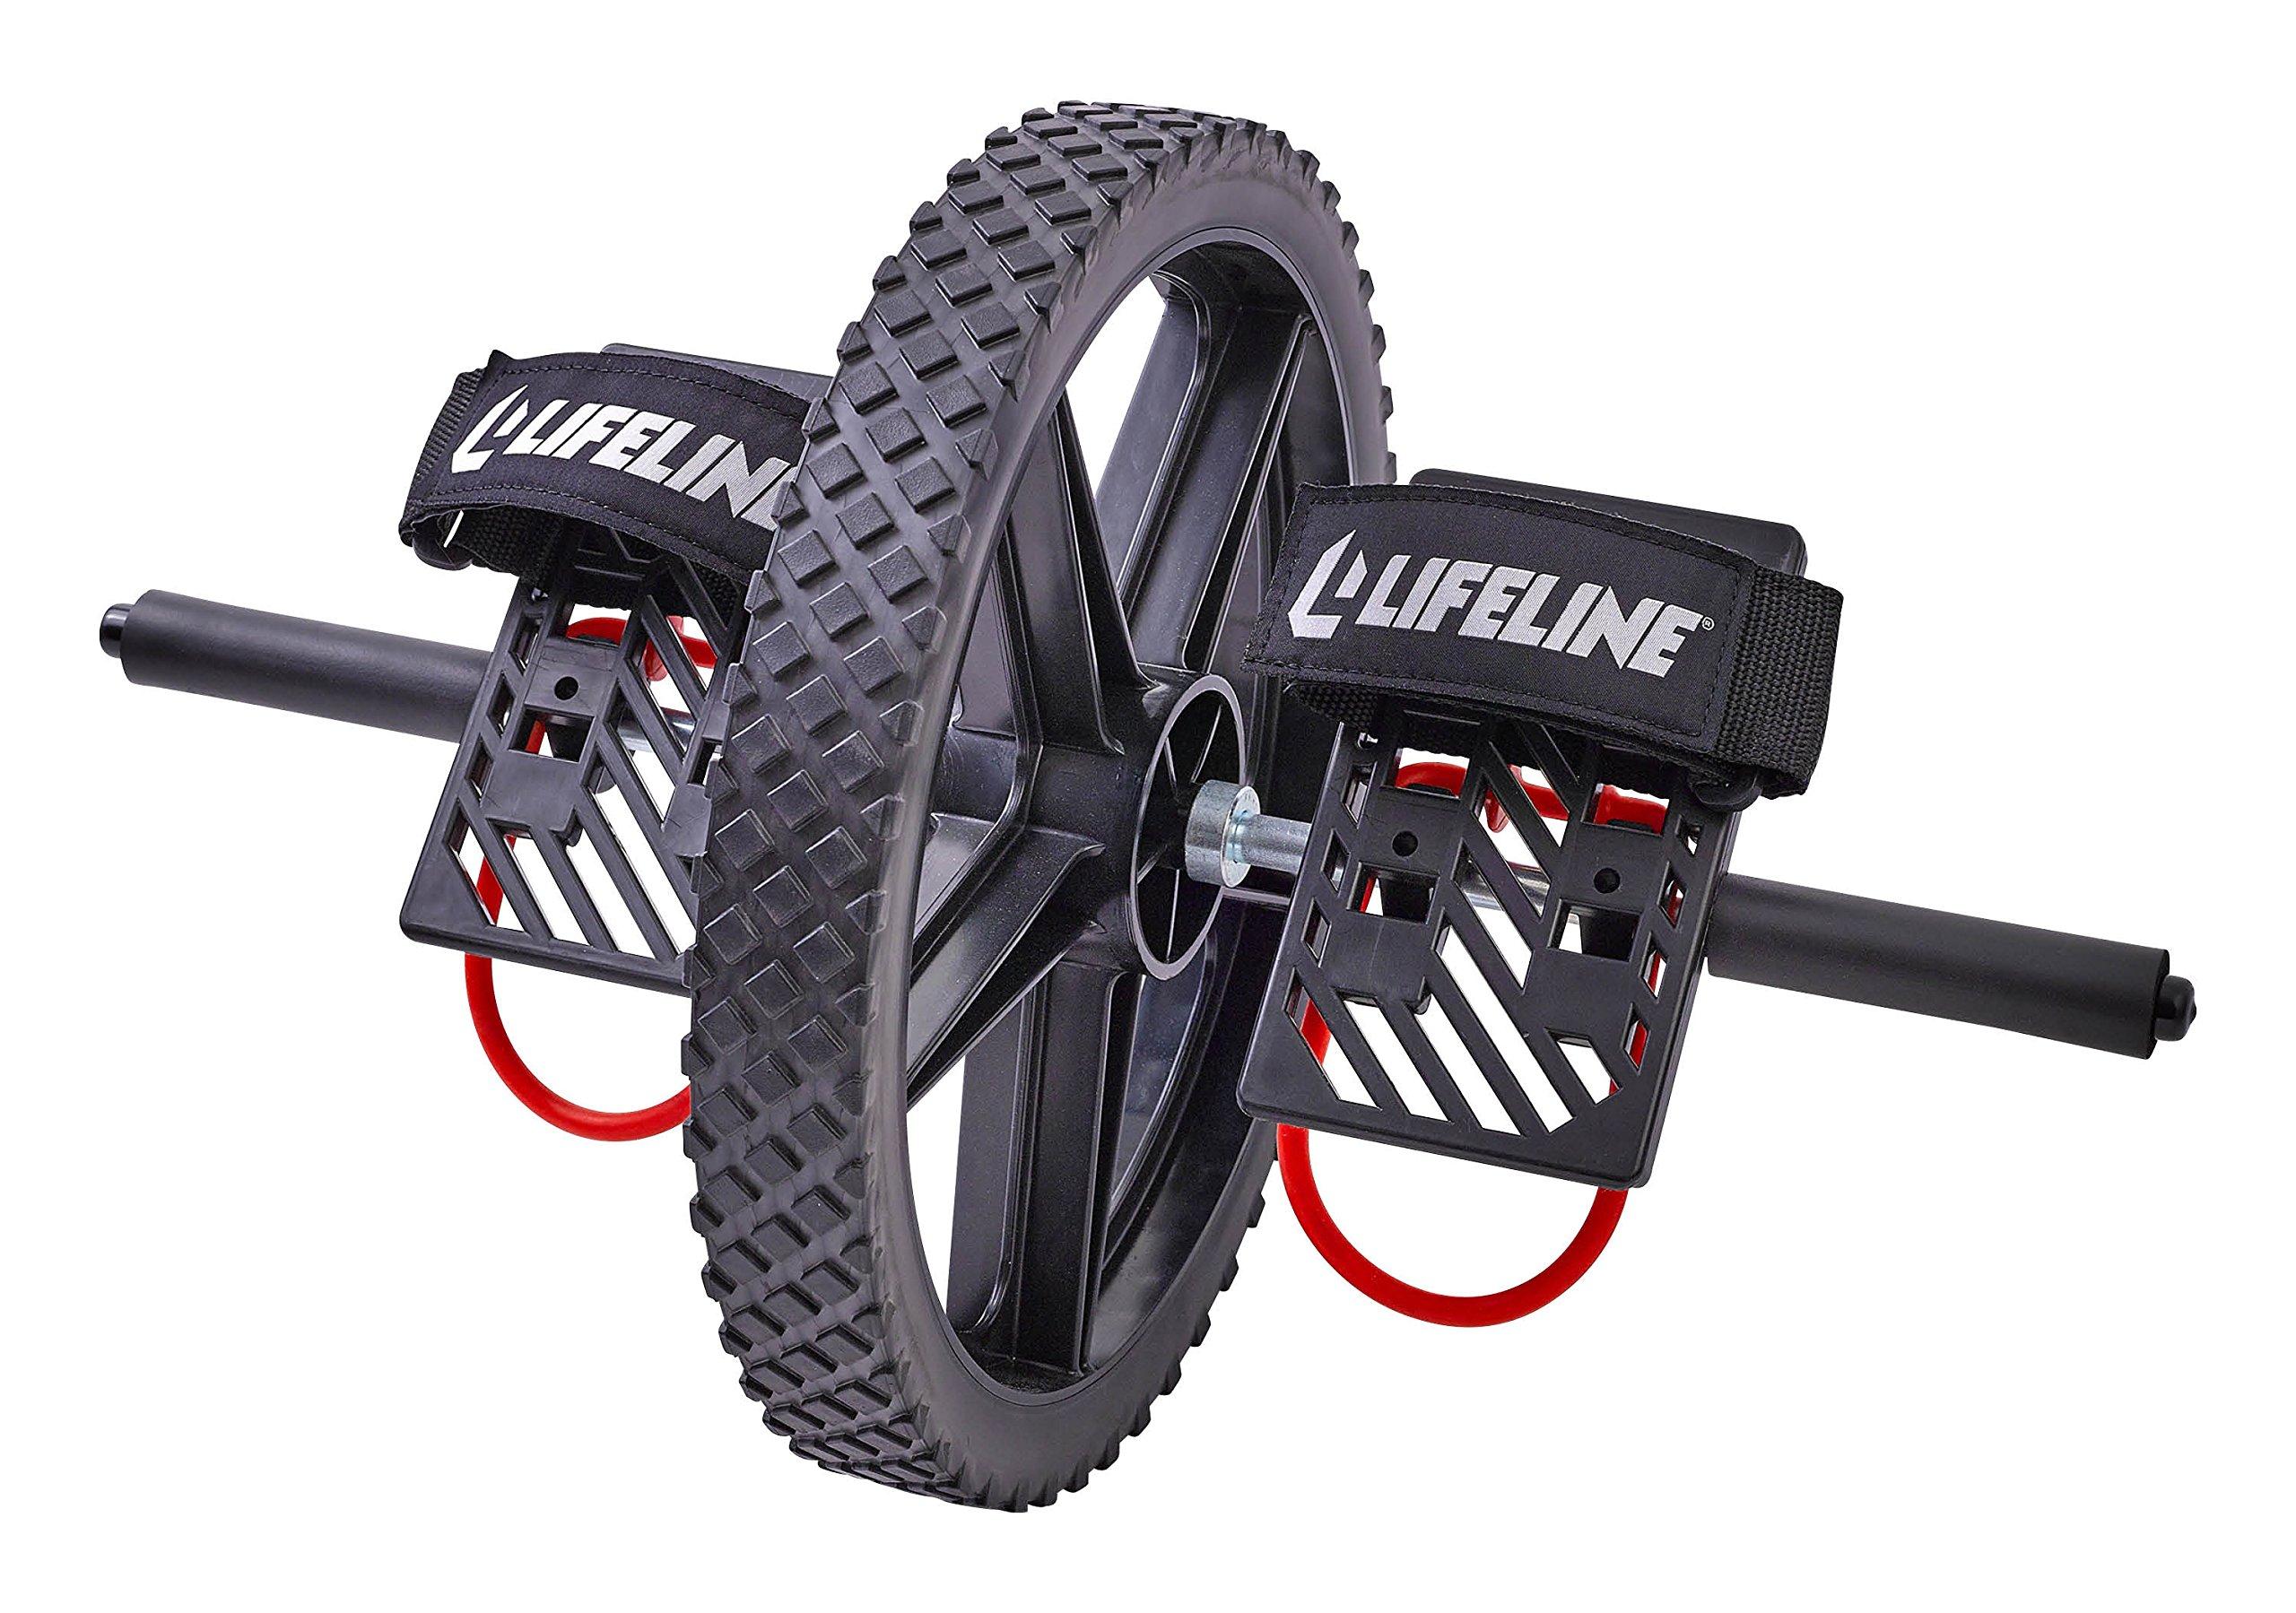 lifeline power wheel exercises pdf